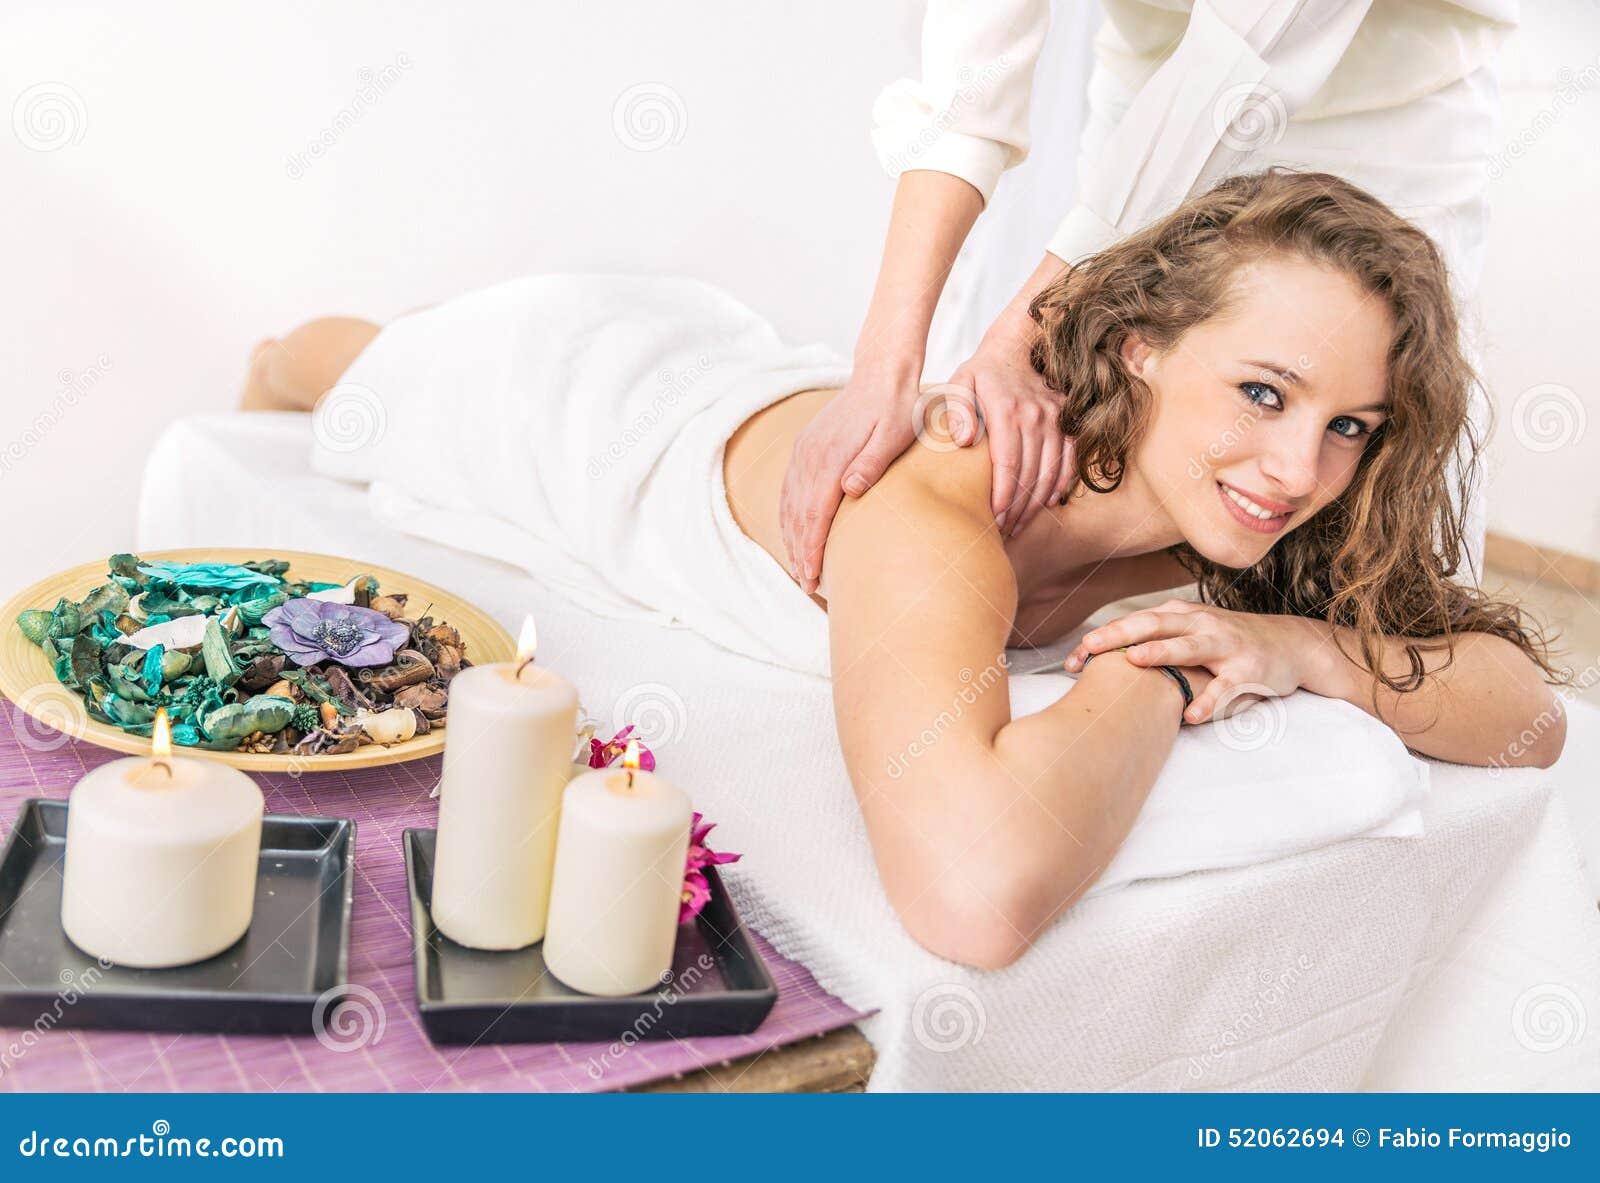 Lisa wyruchał asian massage therapist freak posted